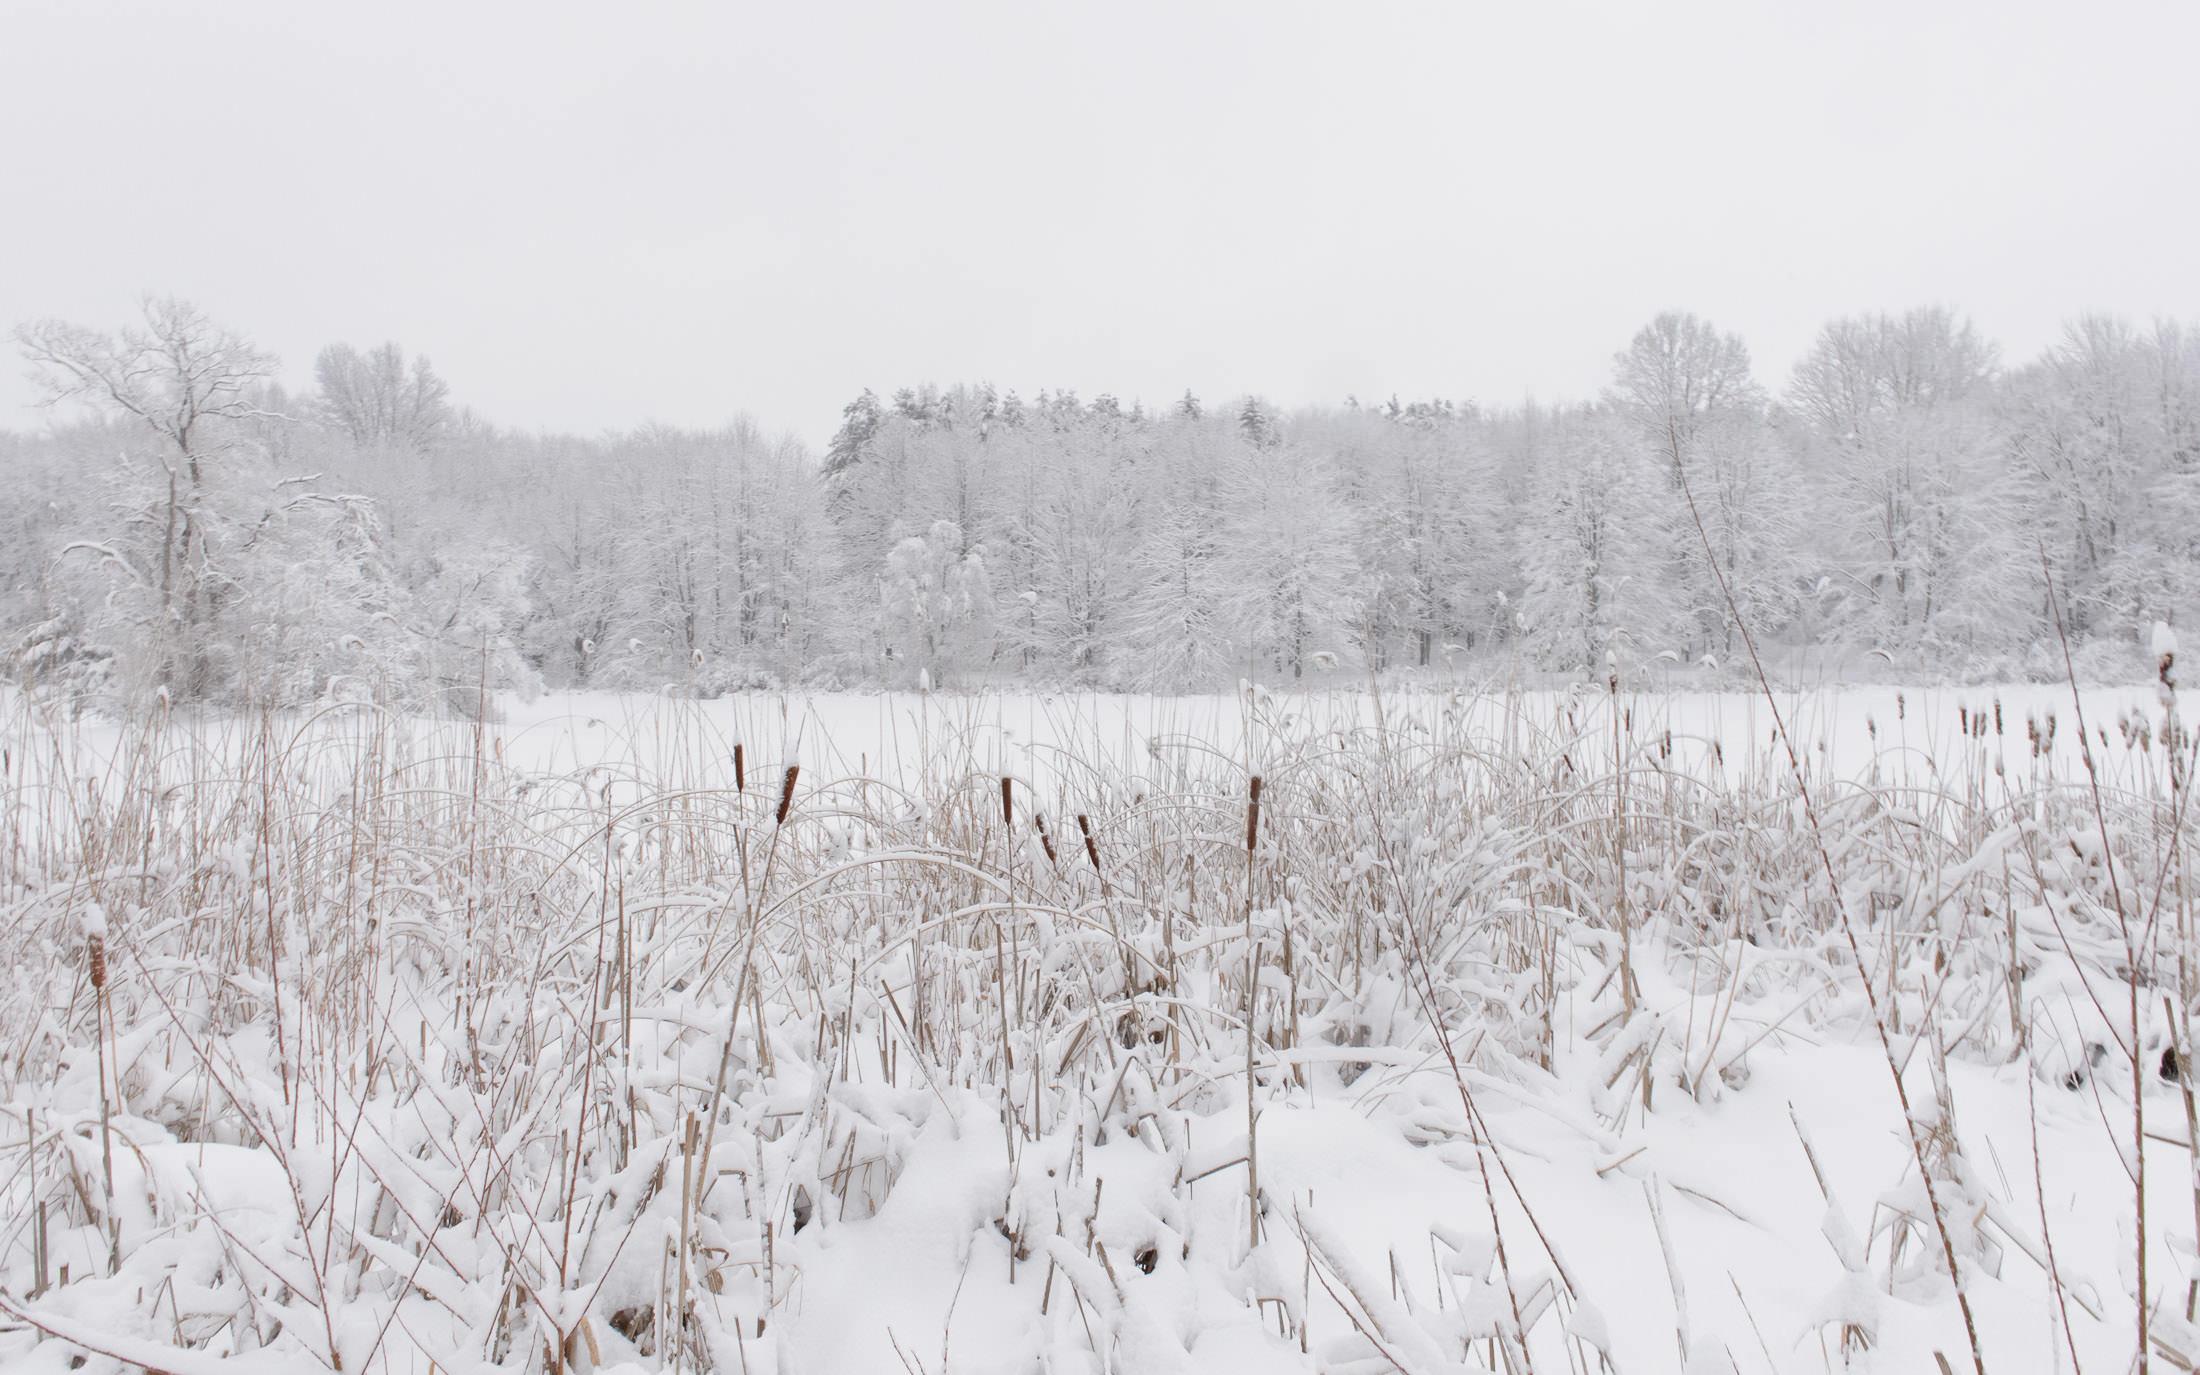 jeffrey friedl's blog » snowy ohio morning, take 2